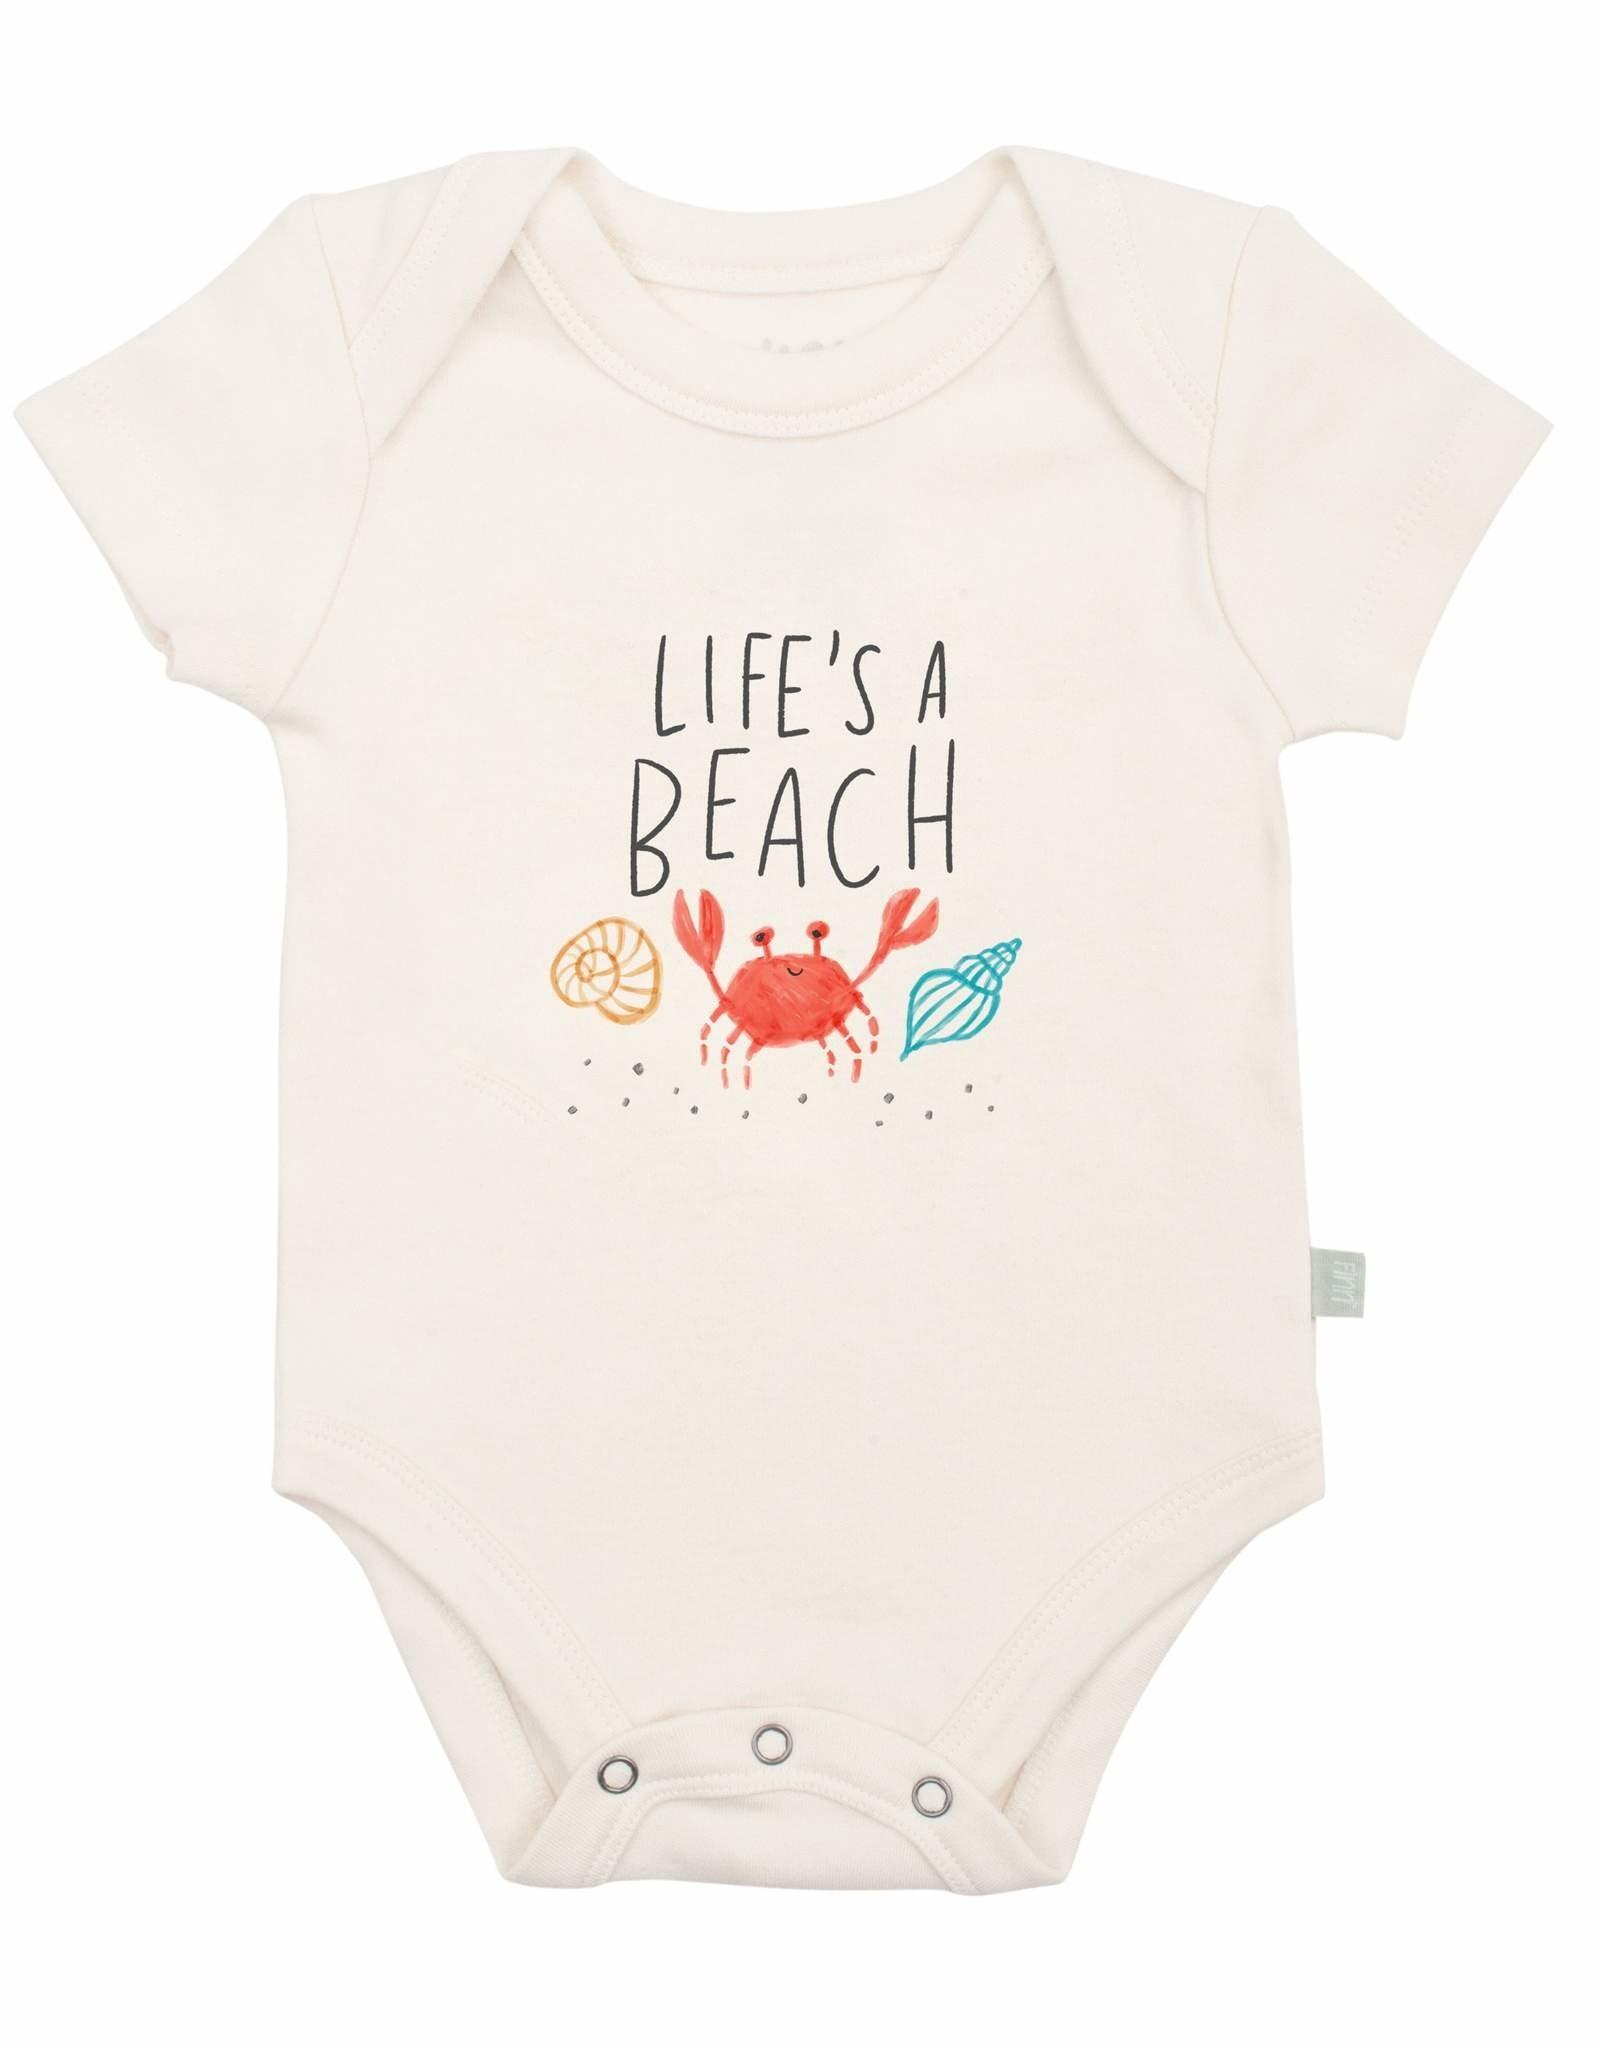 Finn & Emma Life's a Beach Bodysuit